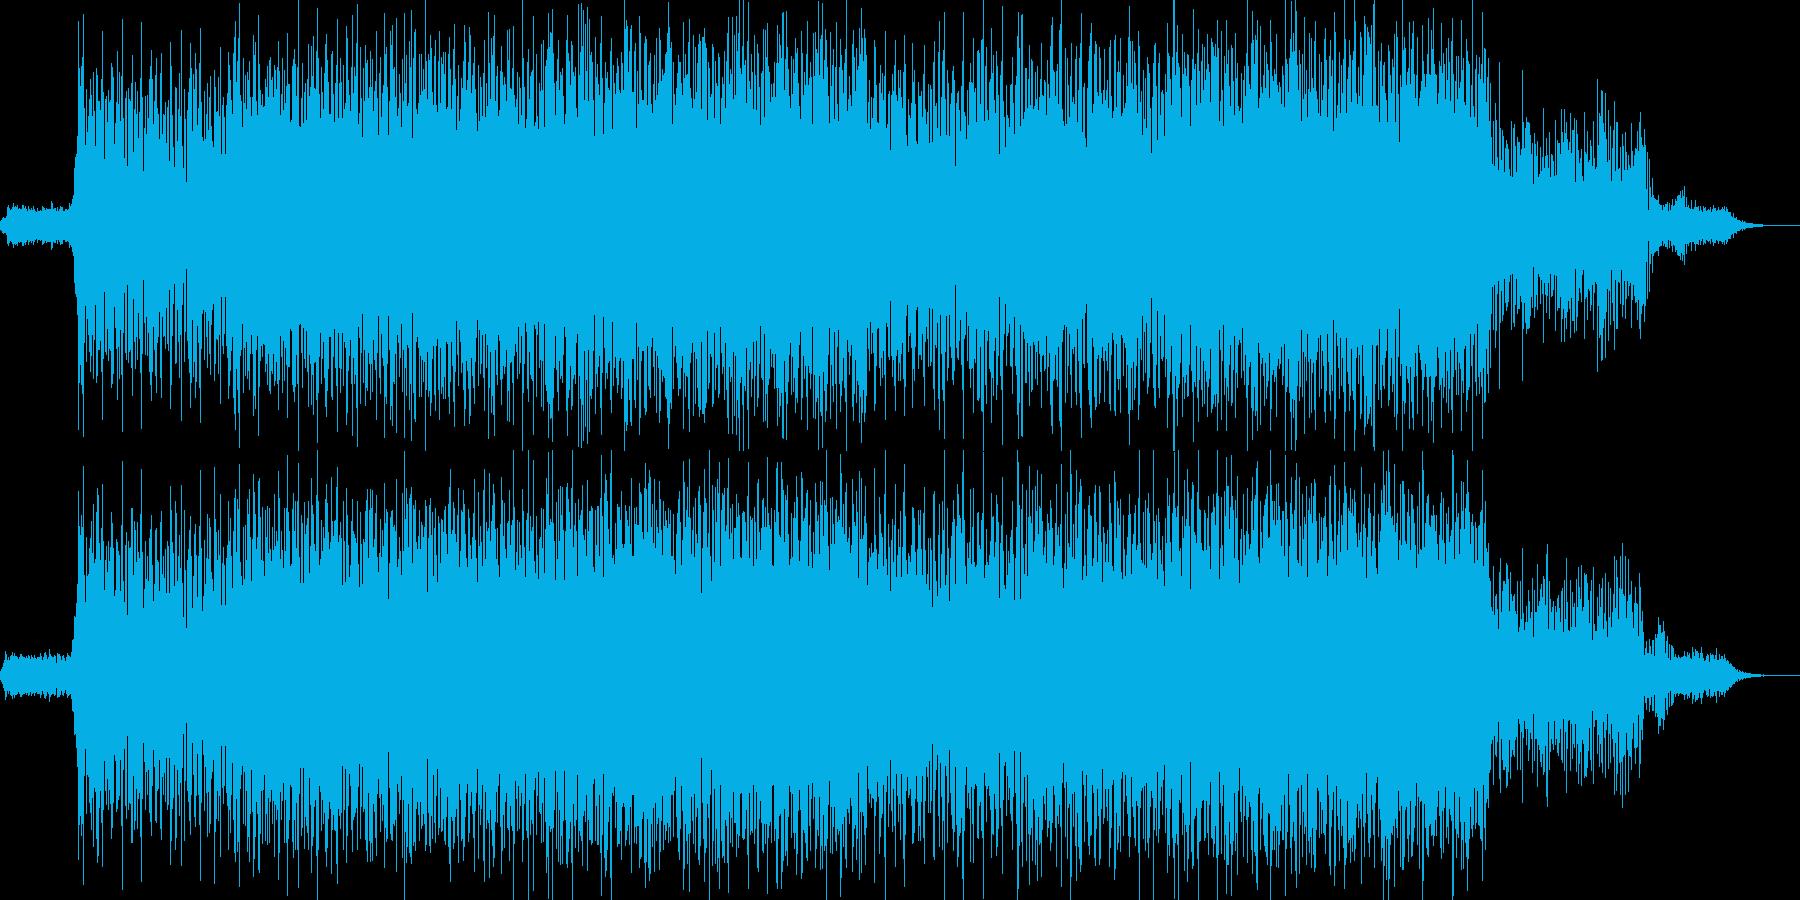 EDM現代的なシンセのクラブ系-04の再生済みの波形